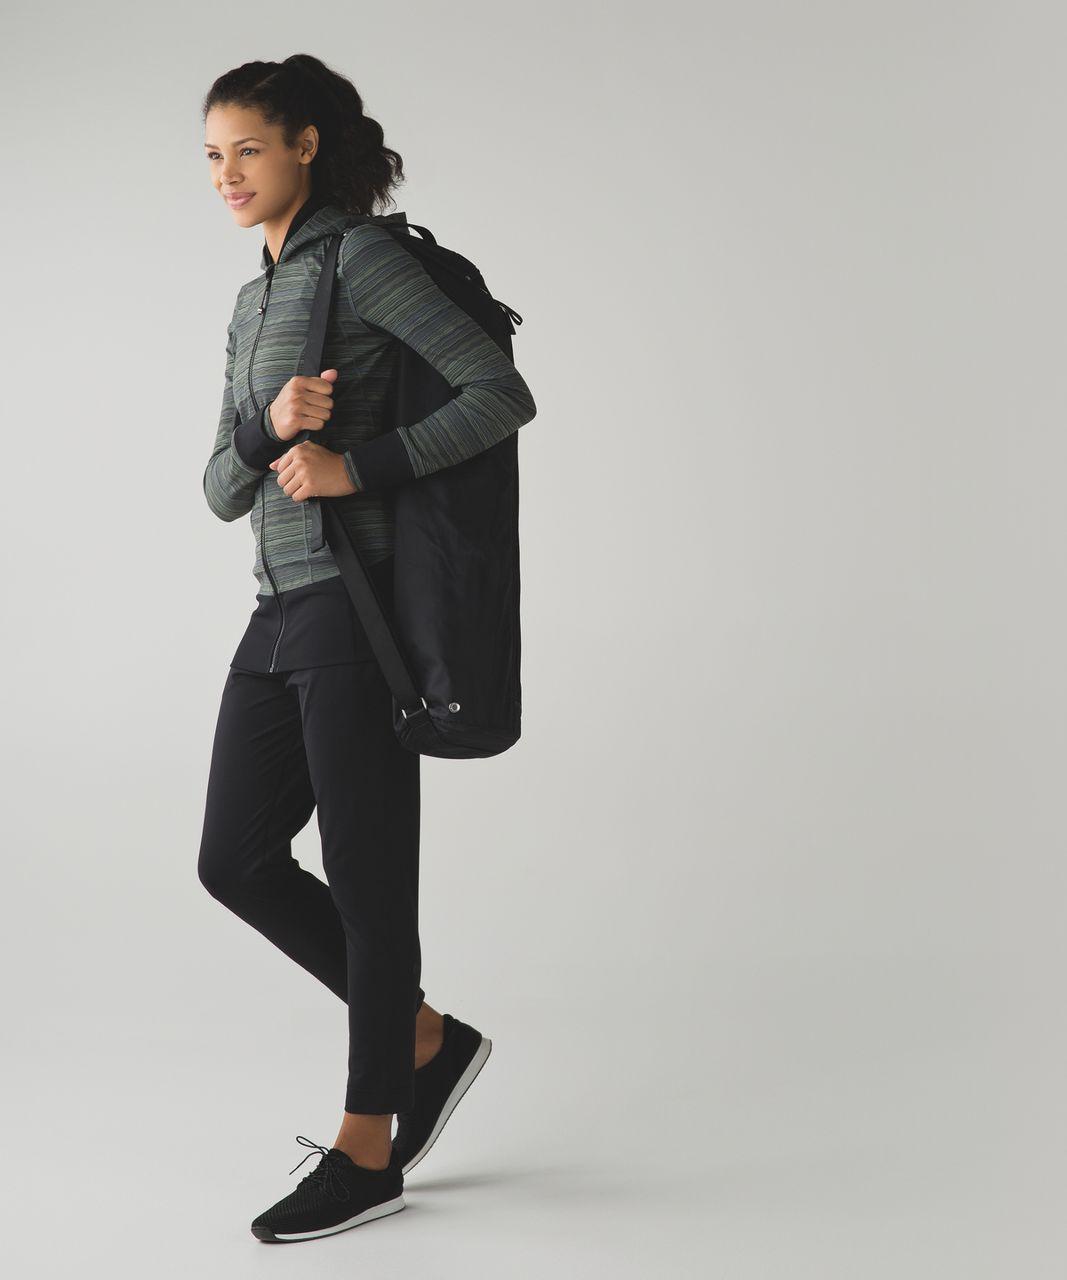 Lululemon Daily Practice Jacket - Space Dye Twist Dark Slate Fatigue Green / Black